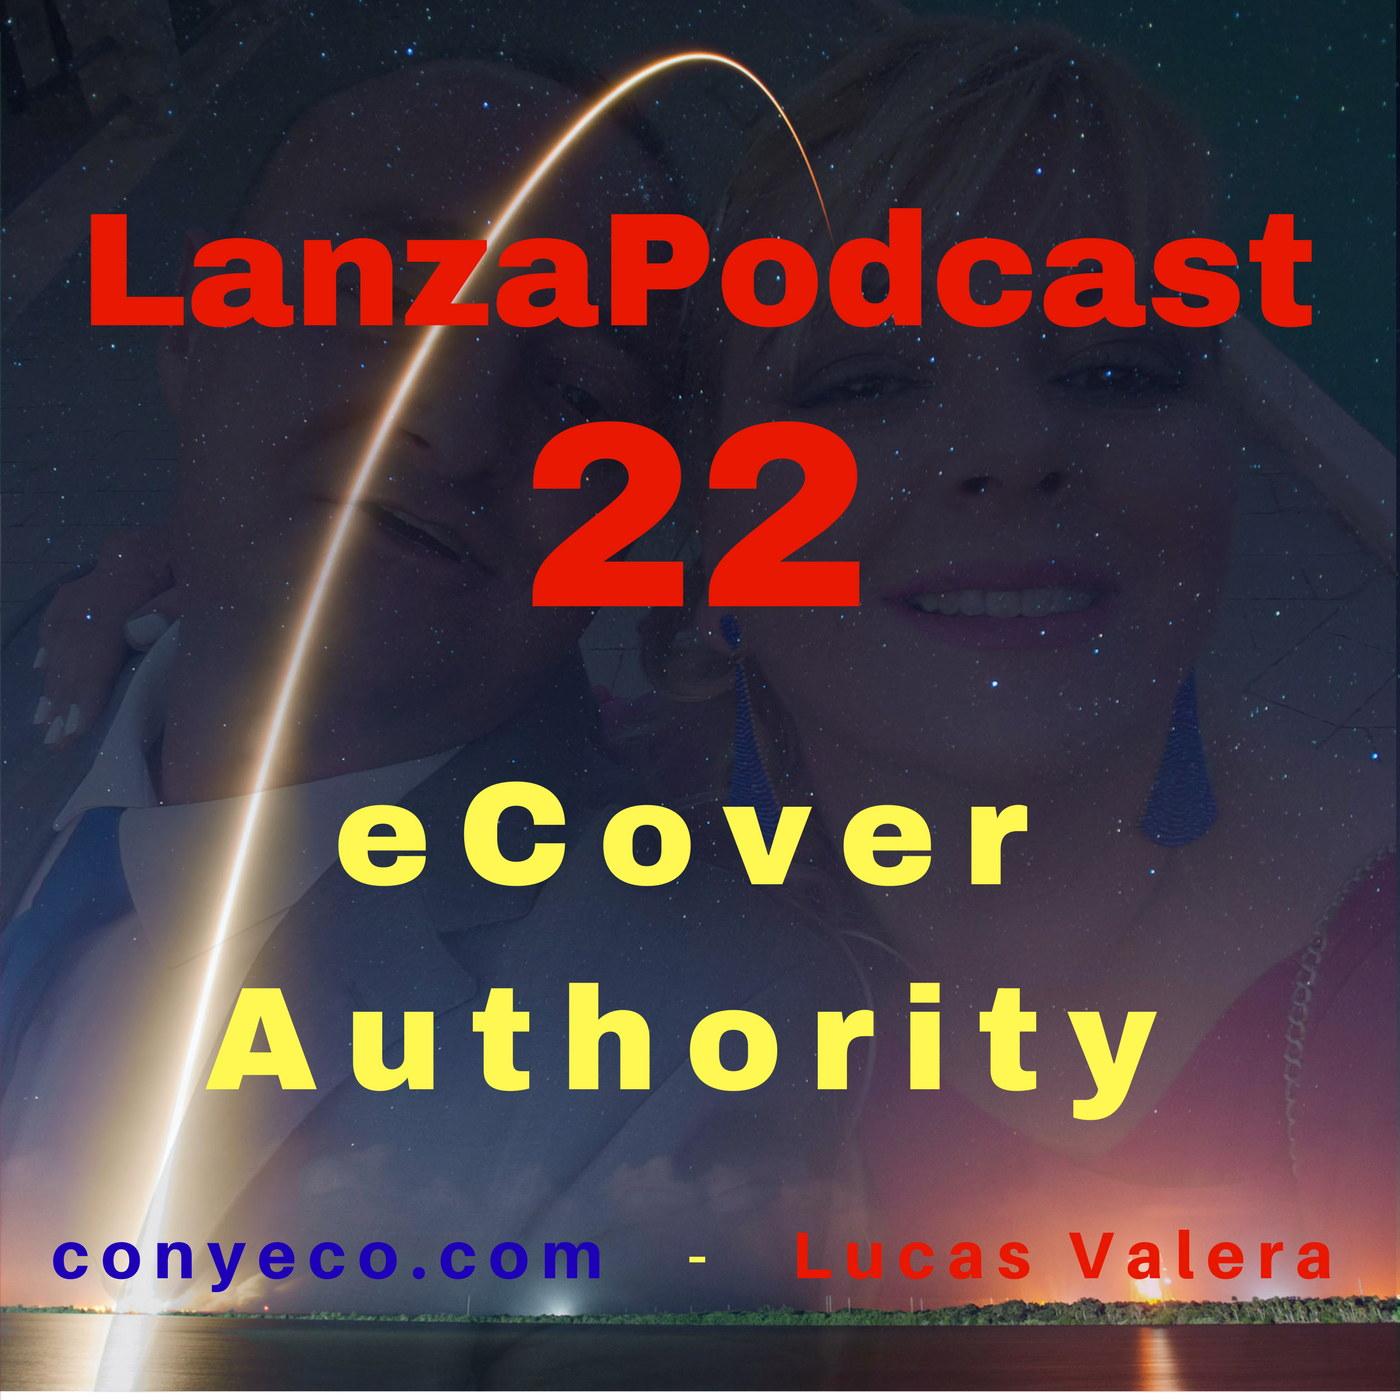 LanzaPodcast-22-eCoverAuthority-conyeco.com-Lucas-Valera